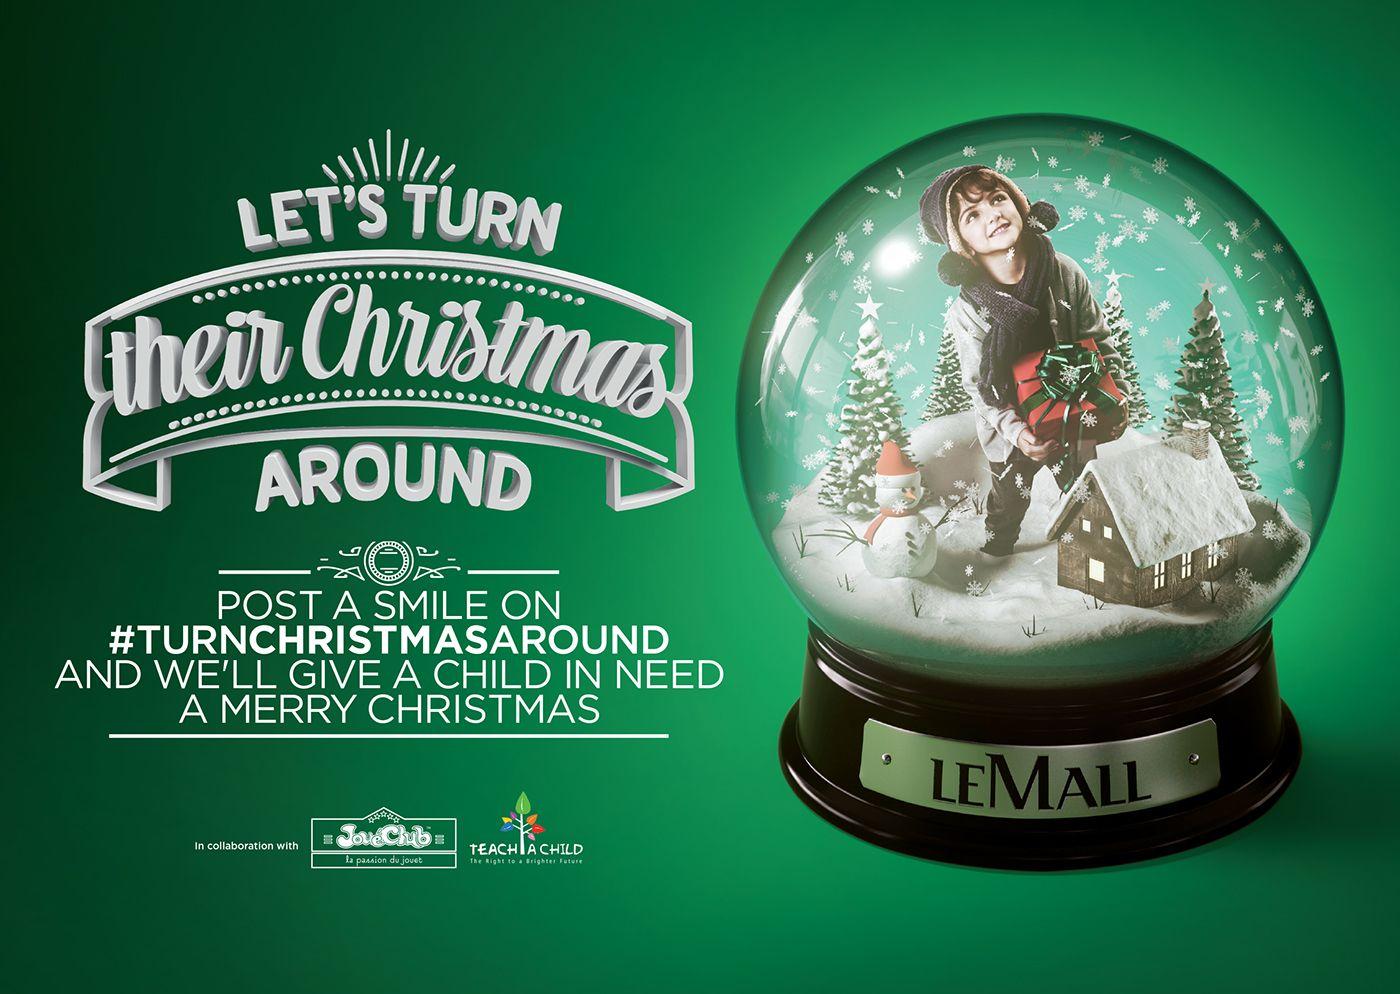 Le Mall Christmas ads 2015 on Behance